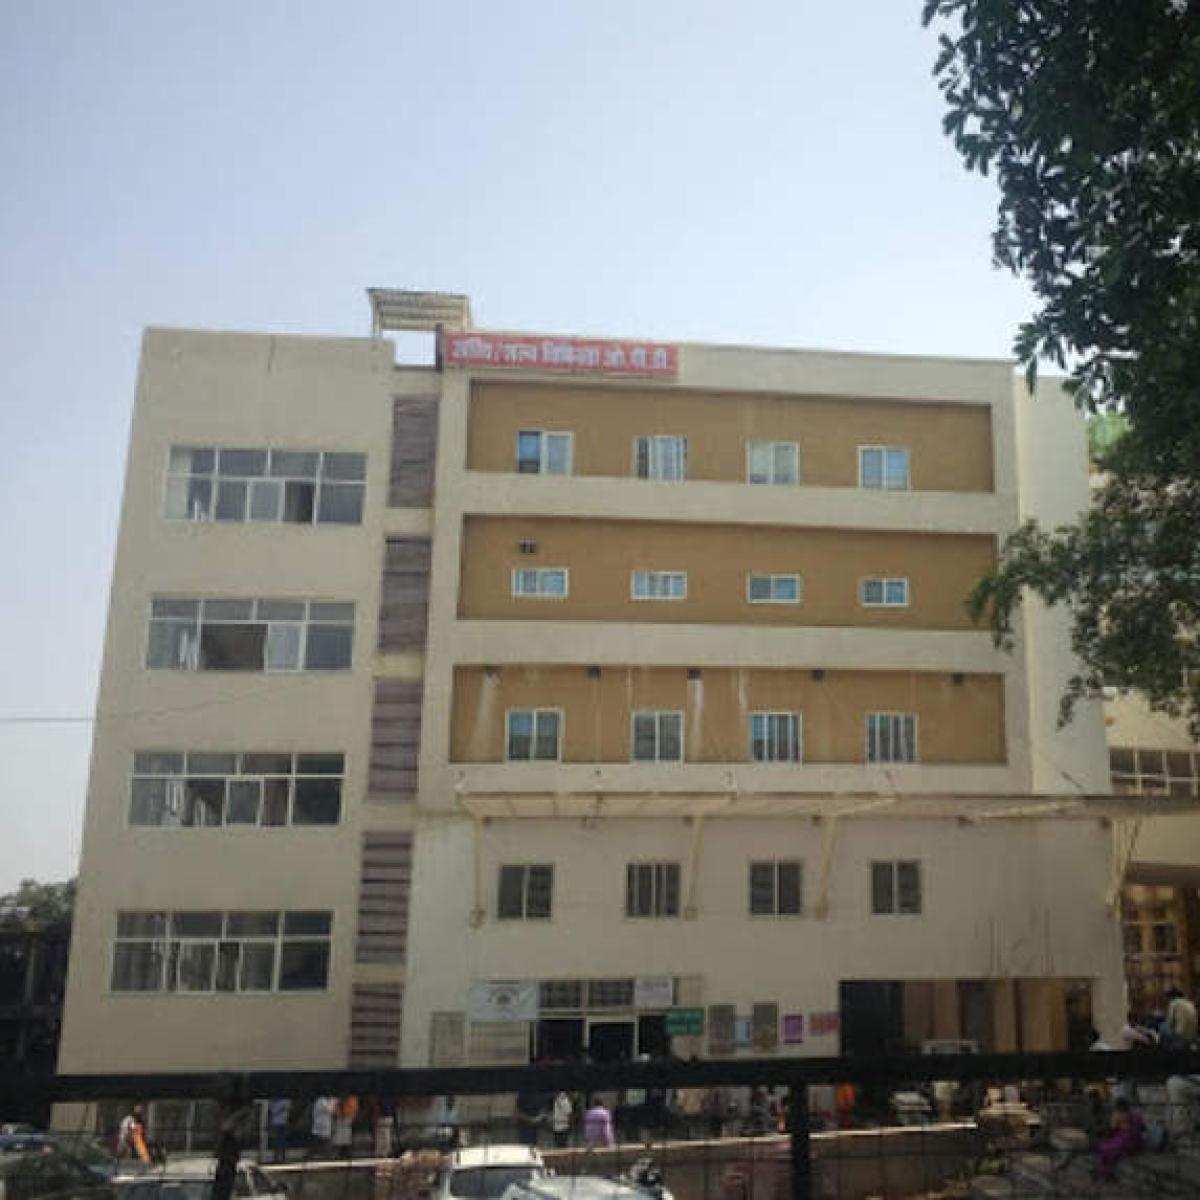 Kota newborn death affect: Bhopal govt  hospitals focus on sanitation, put staff on alert